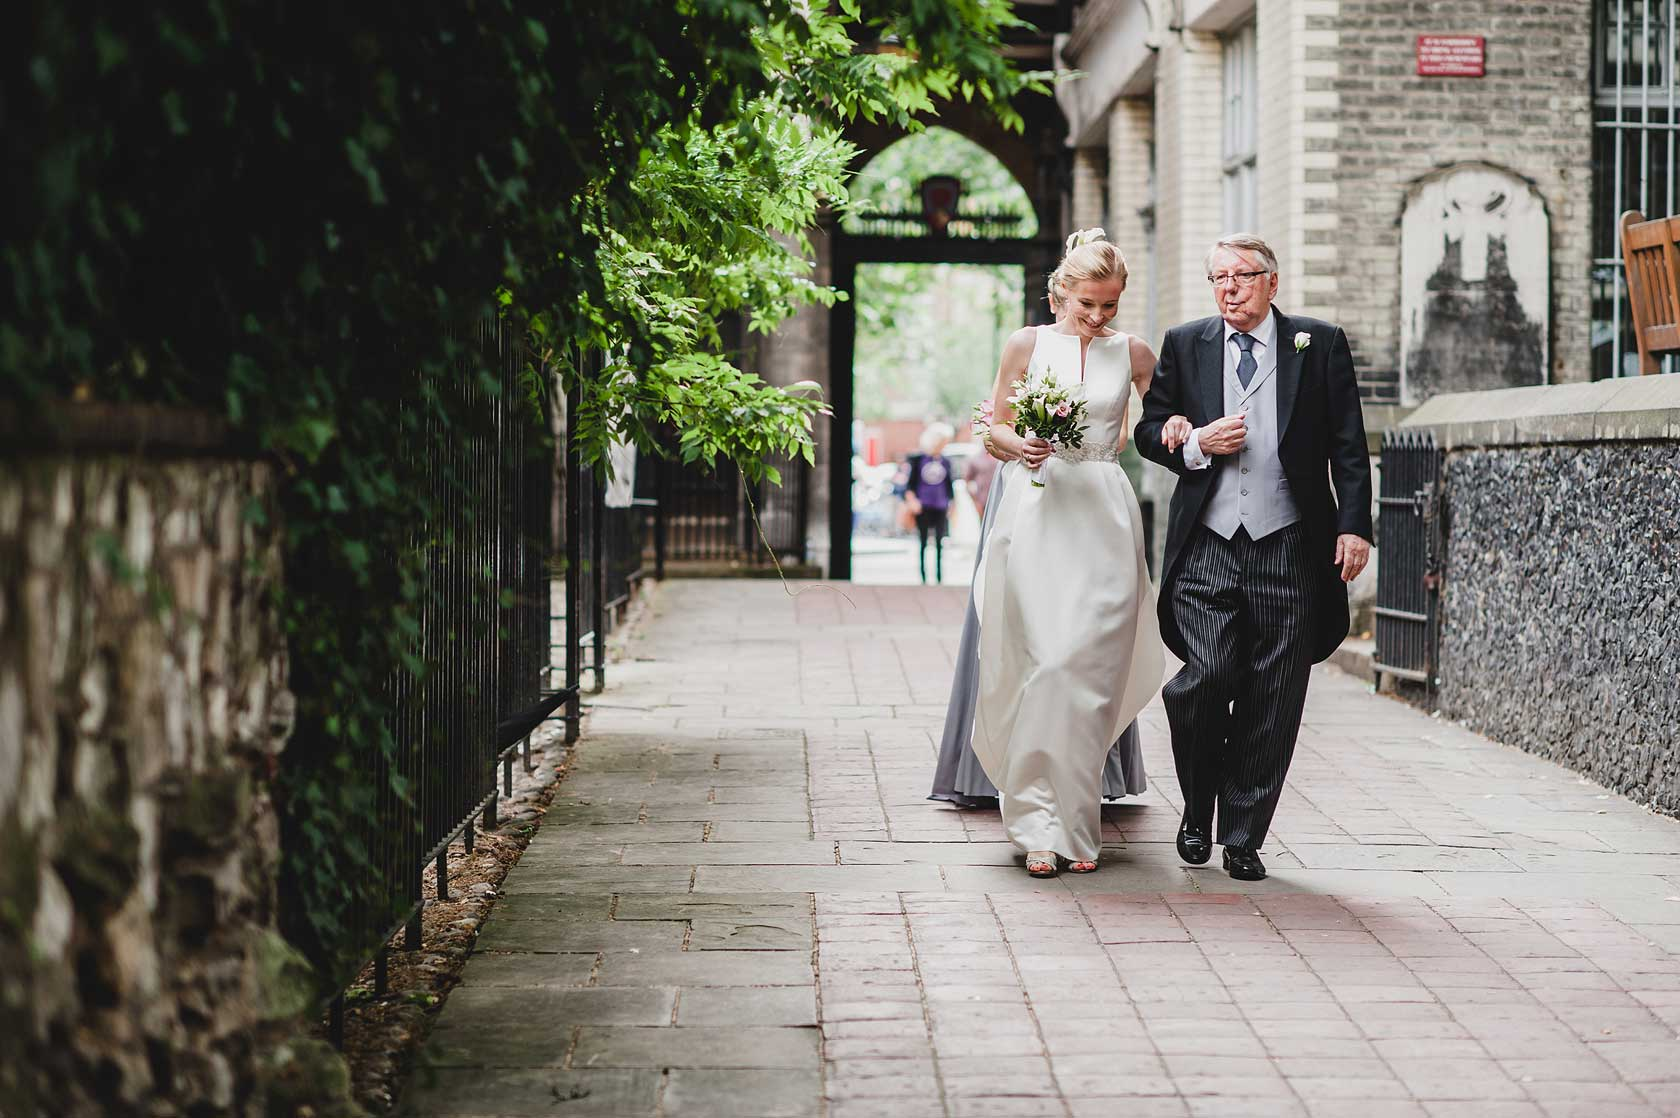 Wedding Photographer at St Barts Hospital